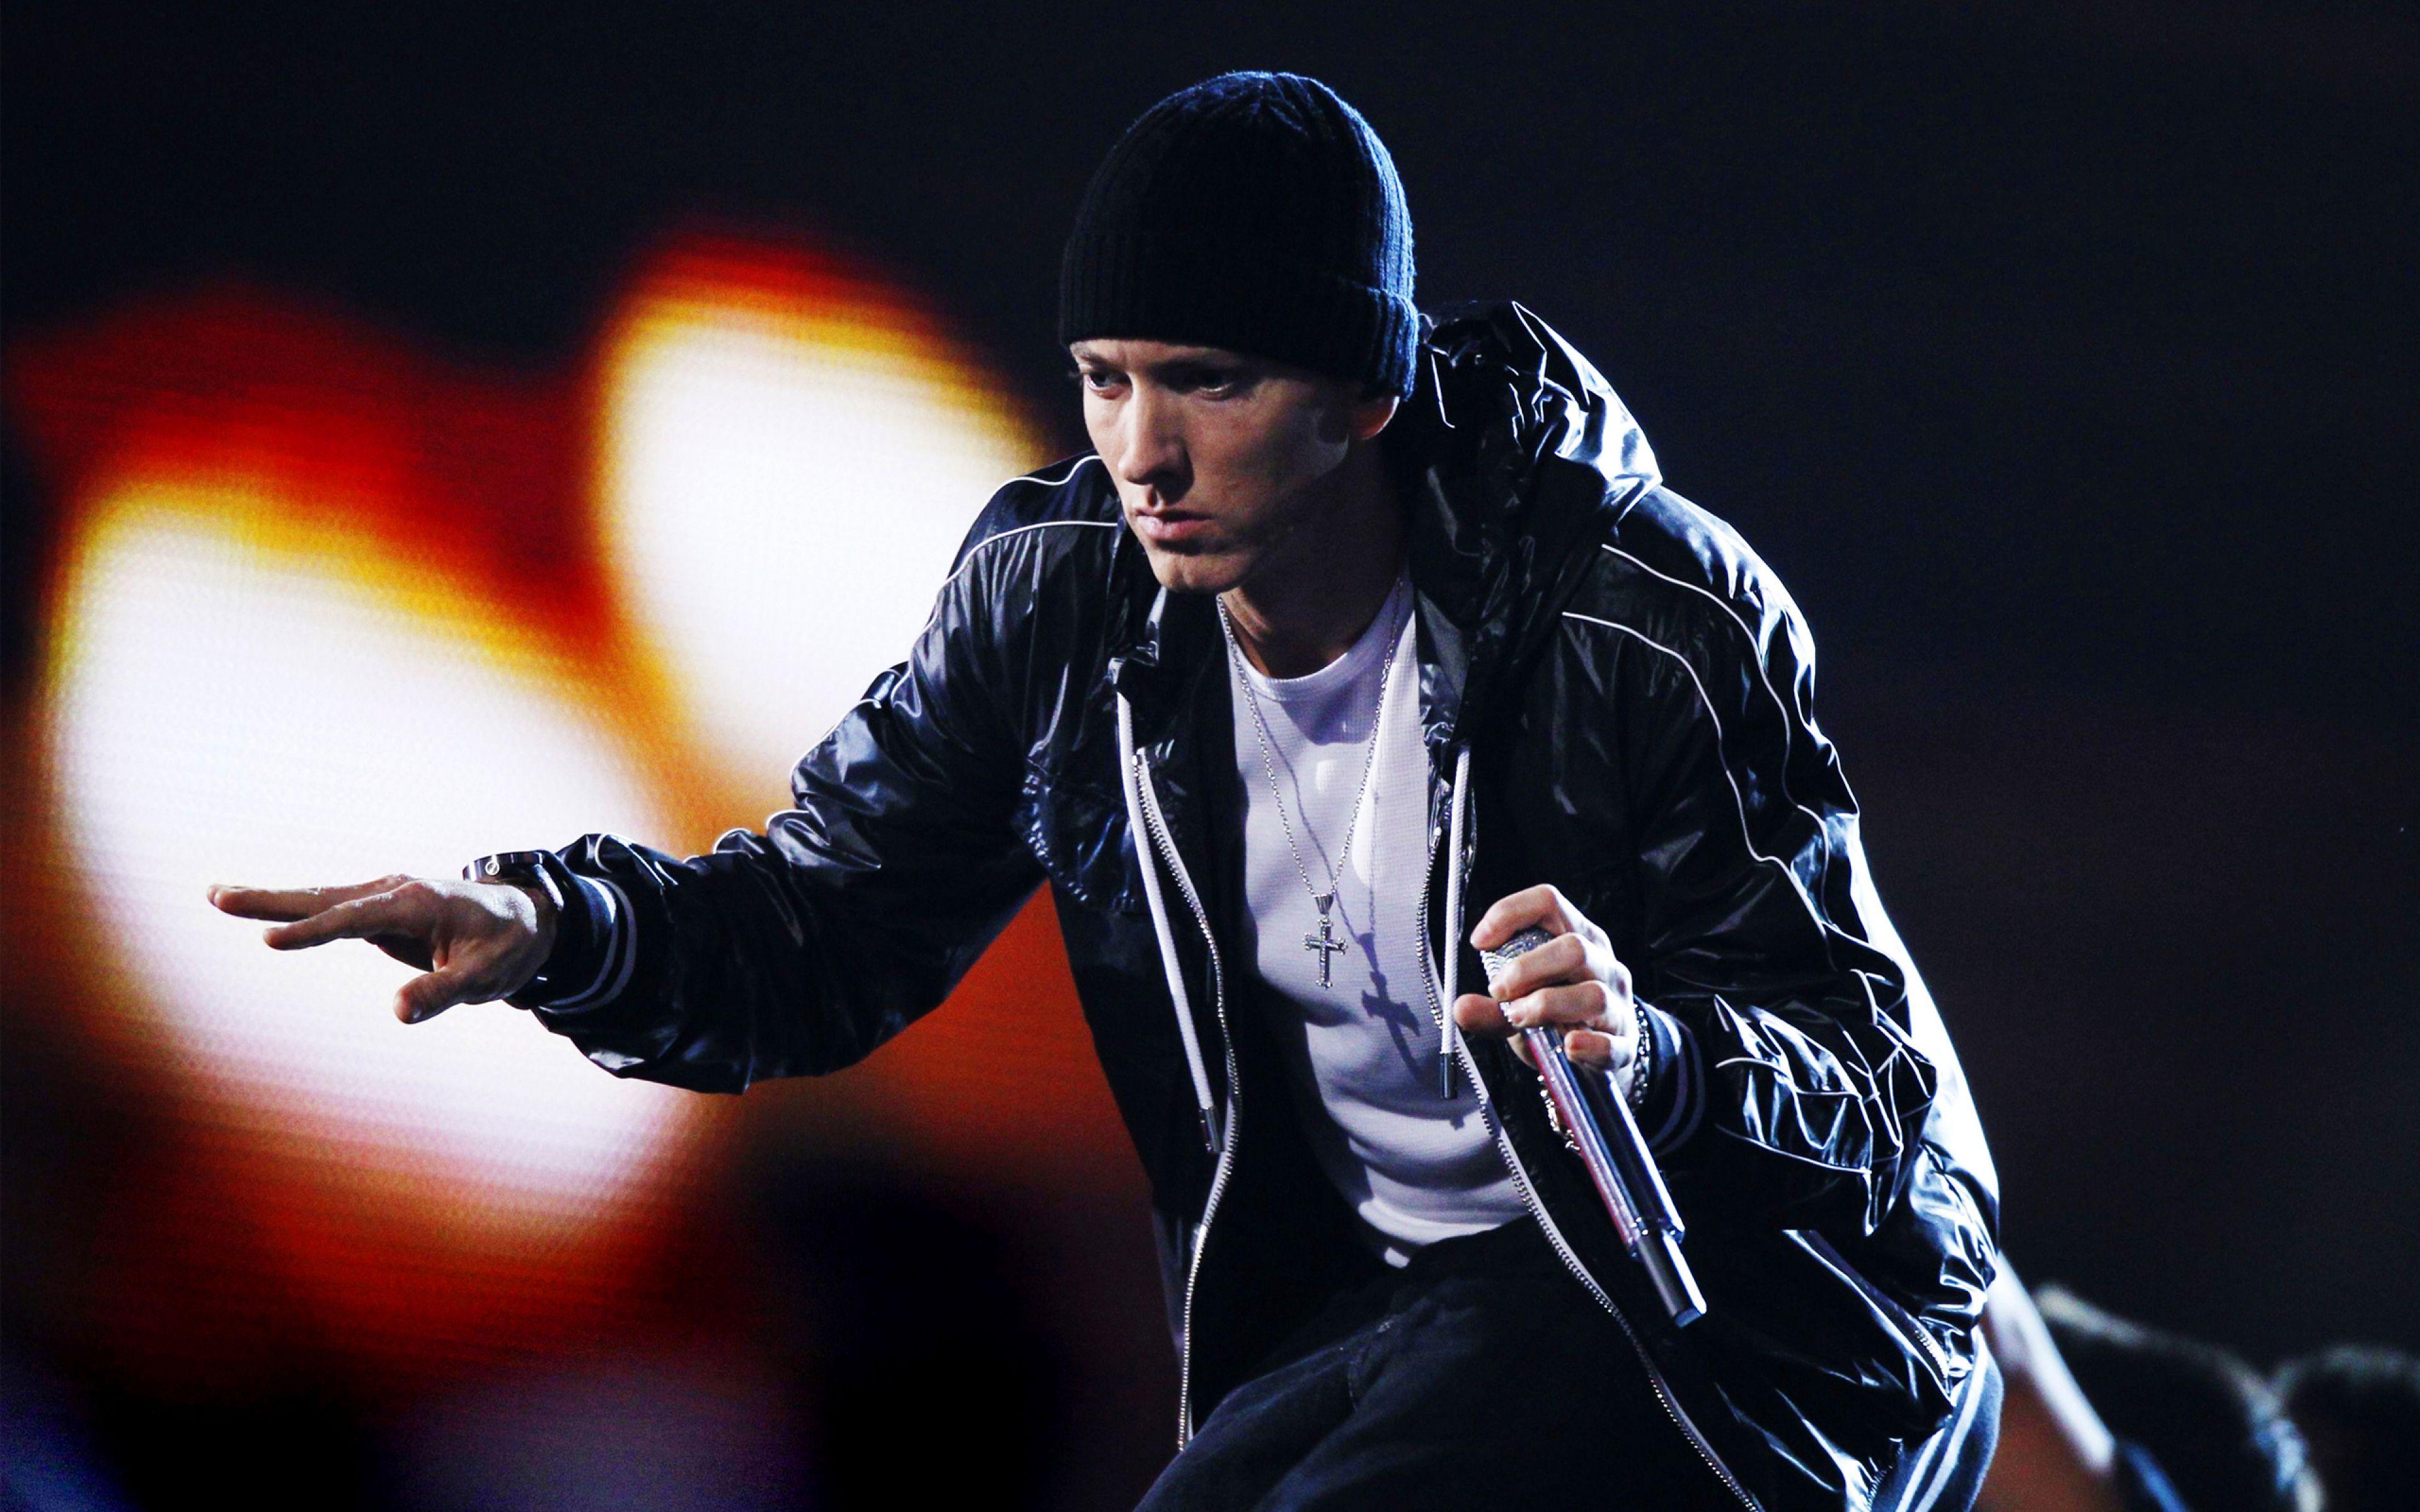 Eminem wallpapers hd wallpaper hd wallpapers pinterest eminem eminem wallpapers hd wallpaper voltagebd Choice Image